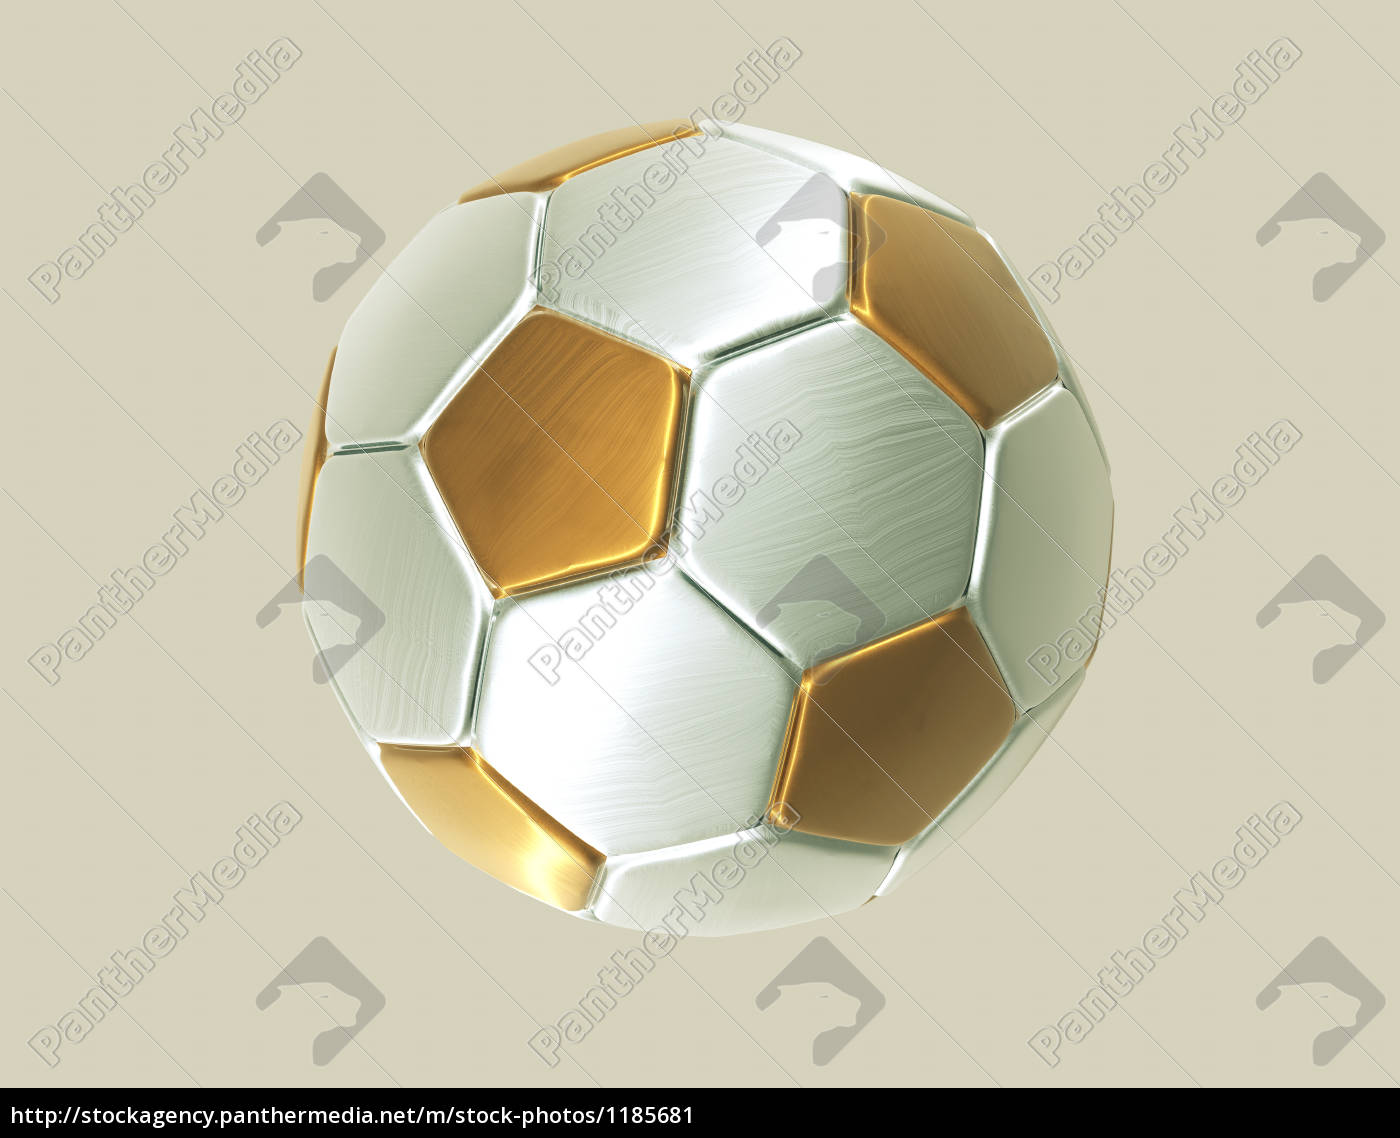 metallic, soccer - 1185681